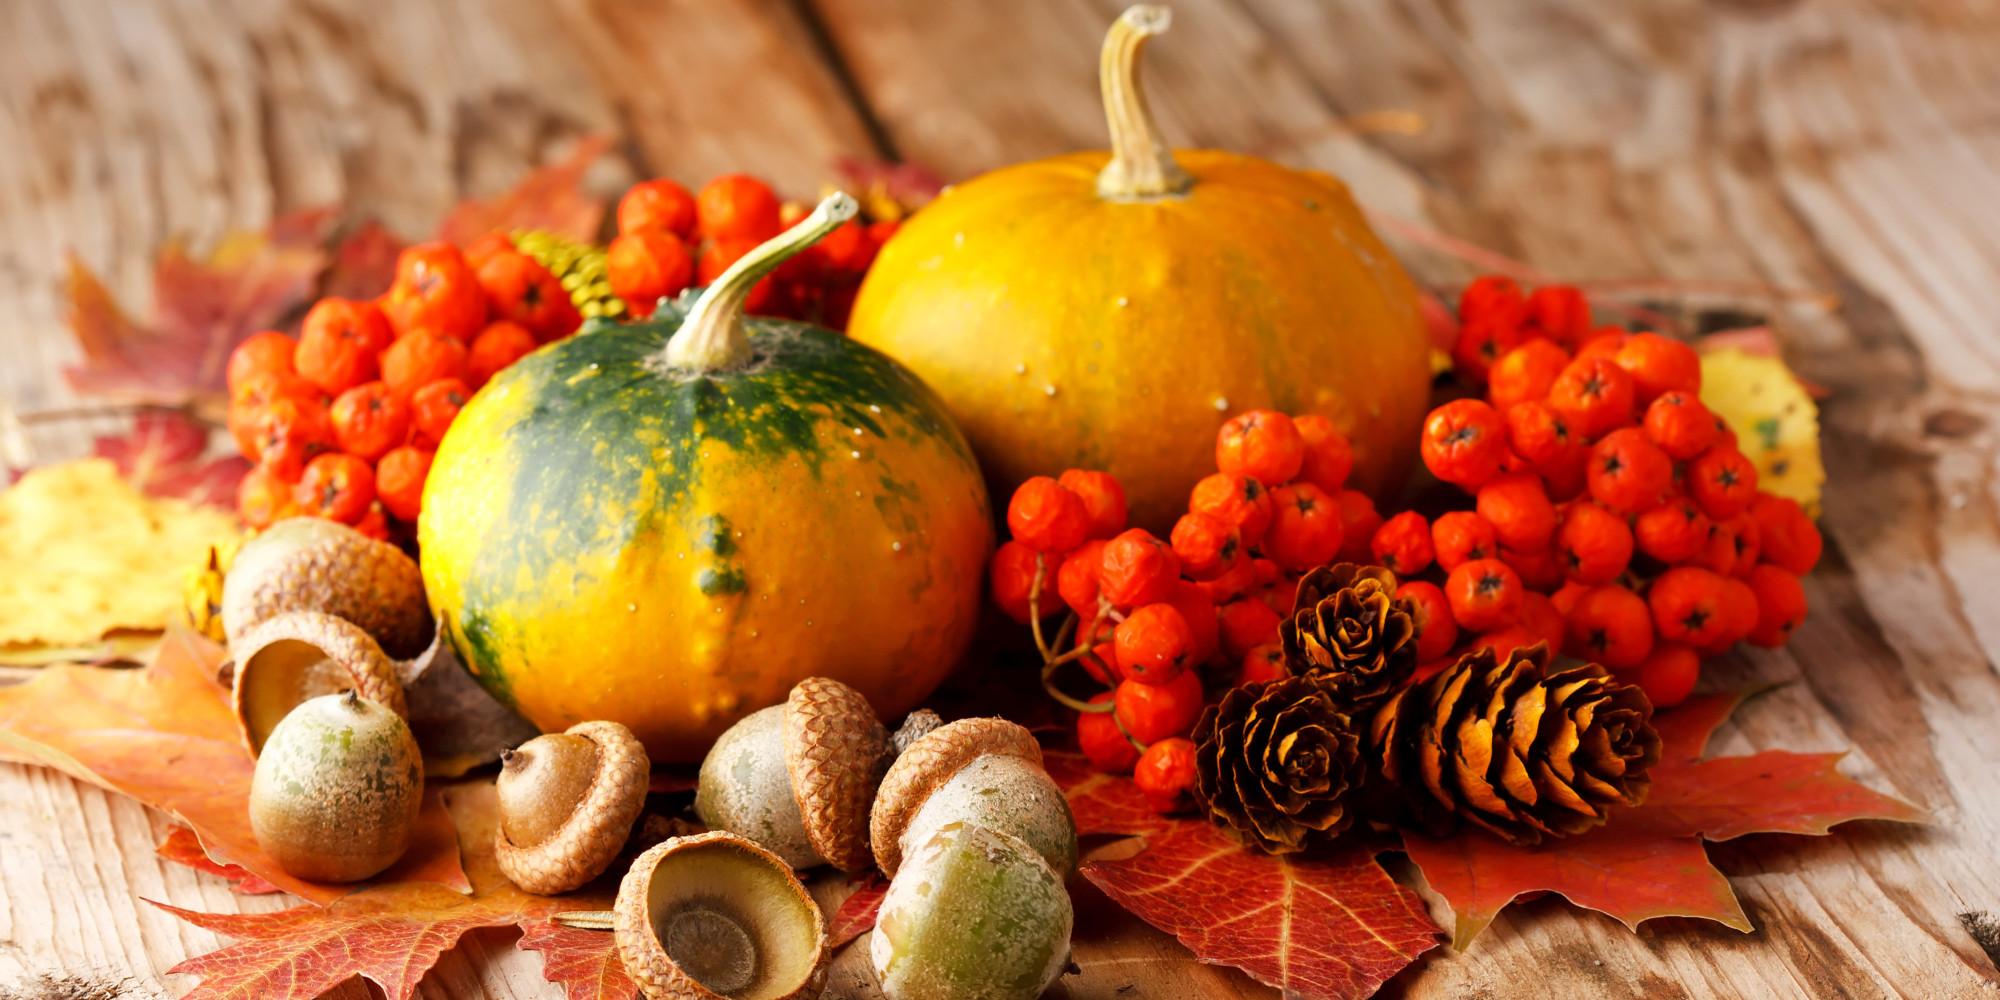 London's Fall Food Festival